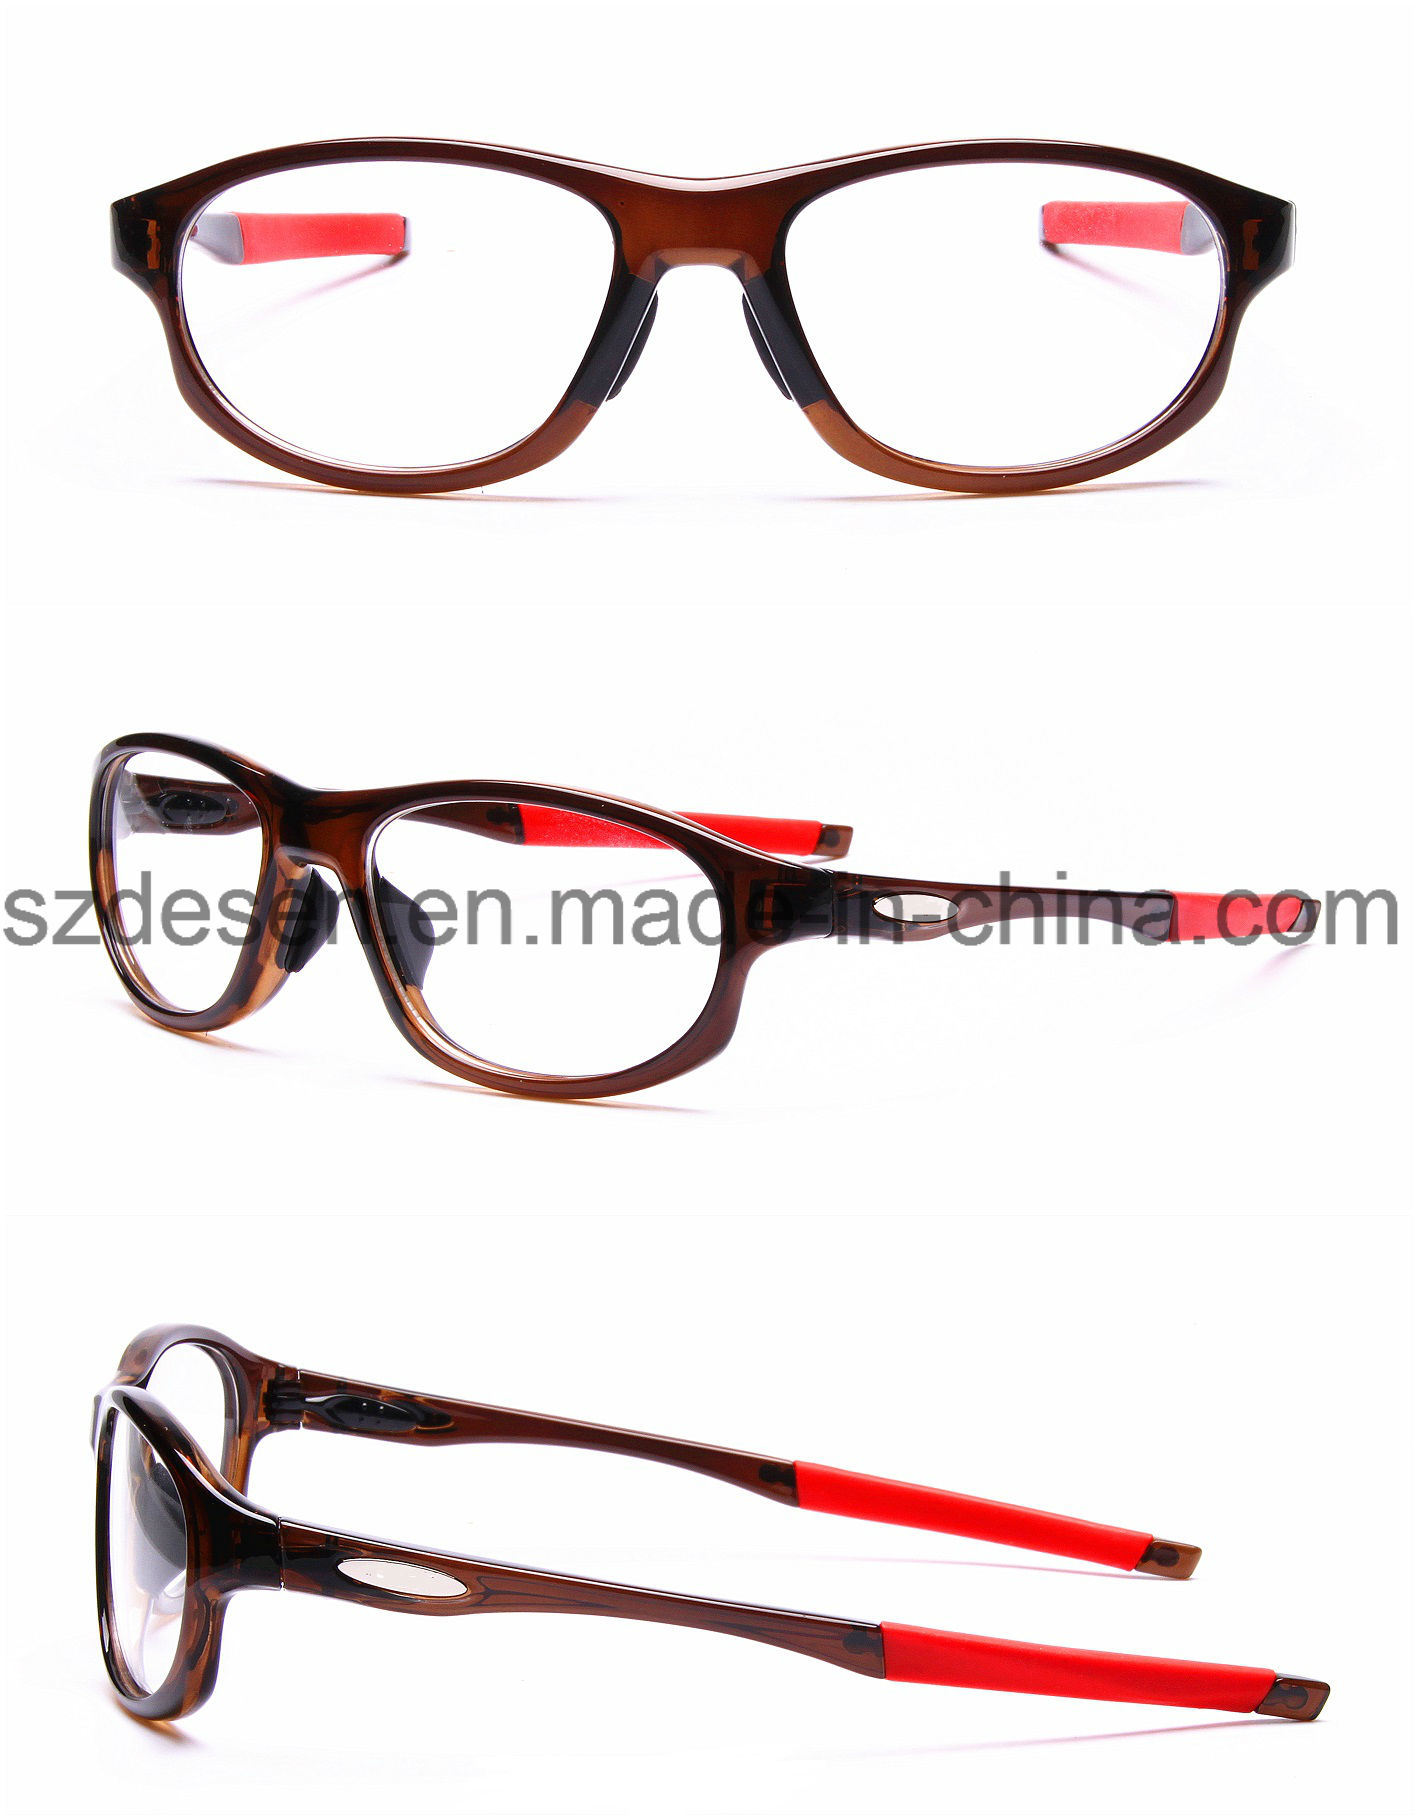 China Wholesale Sport Tr90 Optical Eyeglasses Frame - China Glasses ...